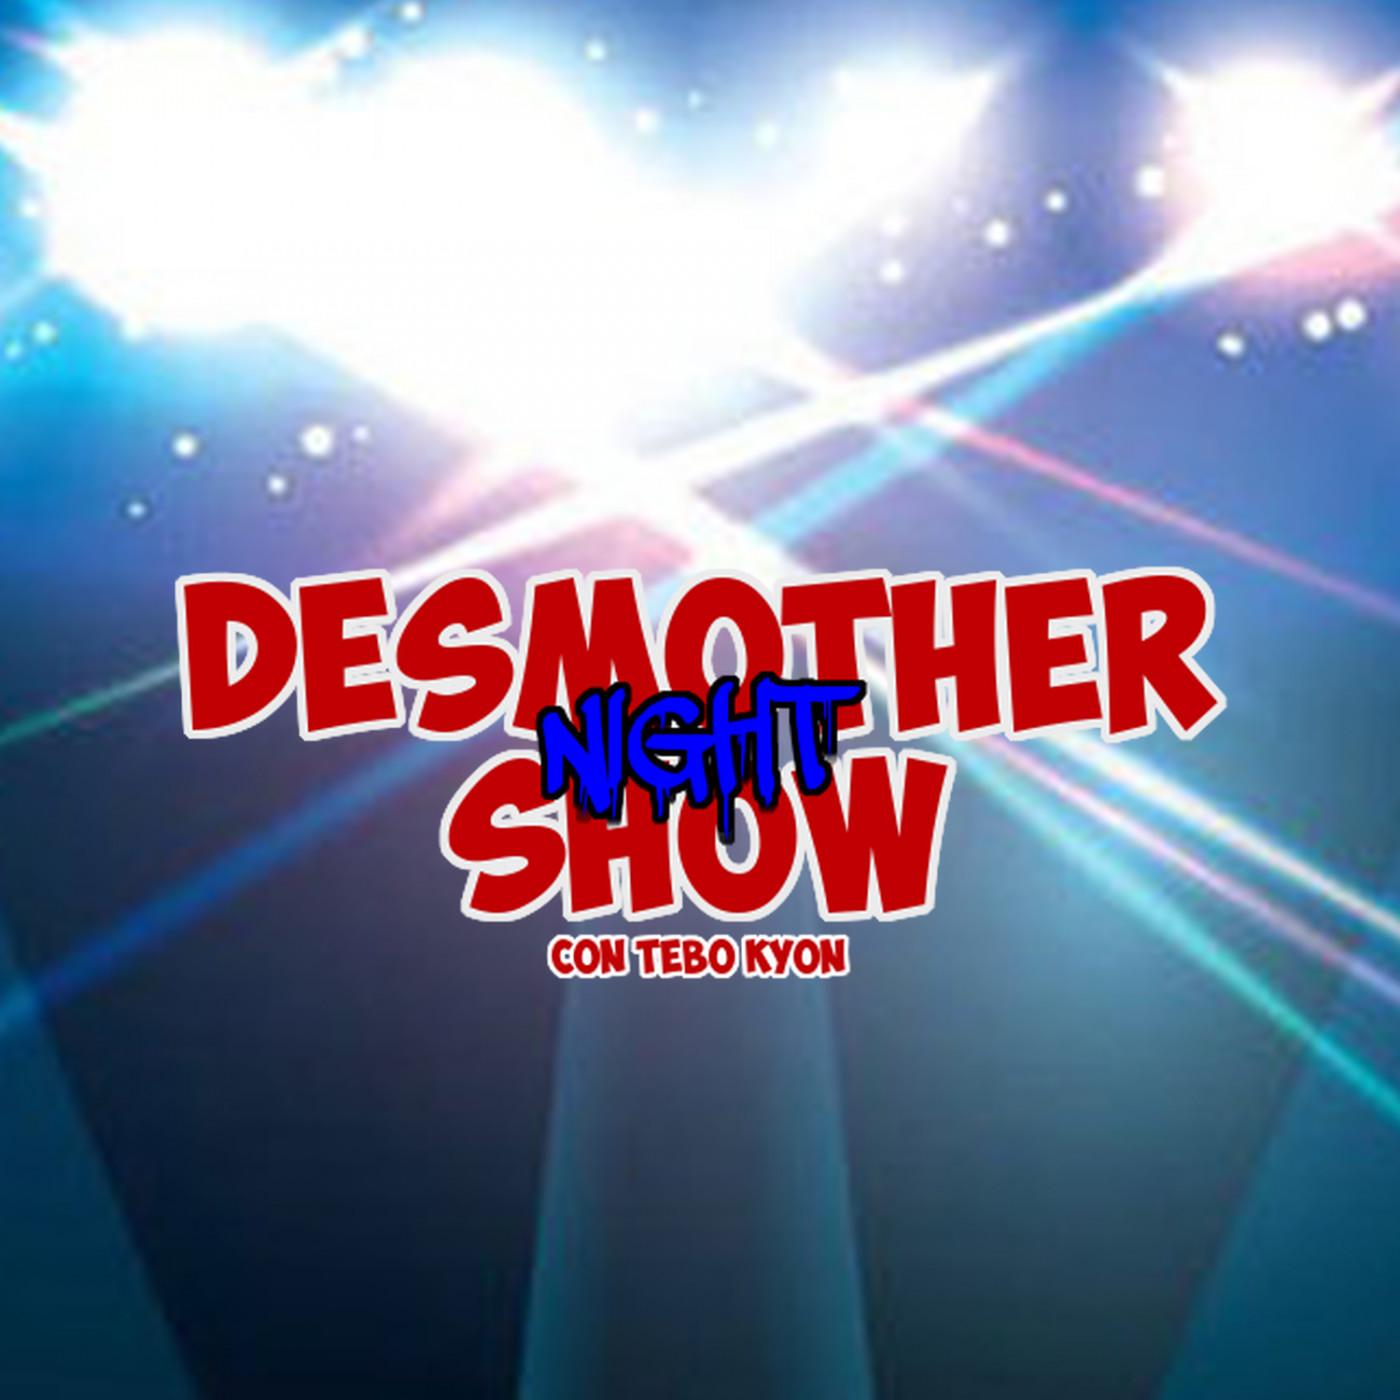 <![CDATA[Desmother Show]]>